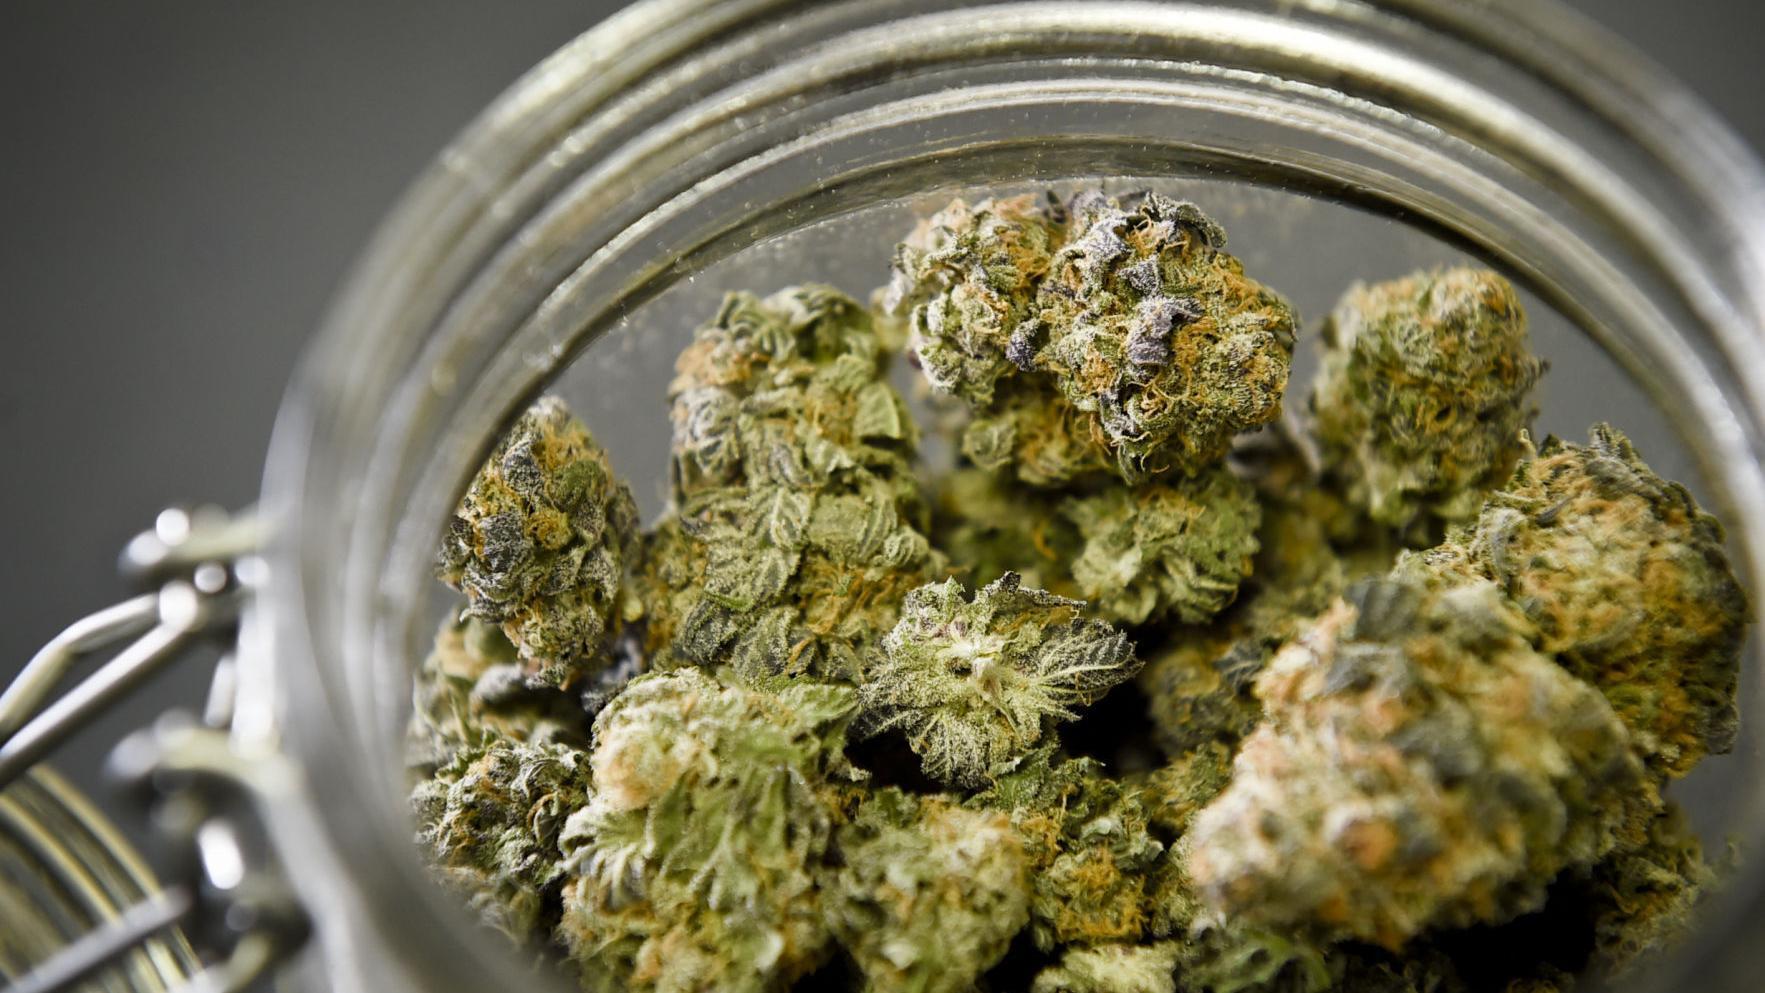 Montana health department sets temporary rules for medical marijuana